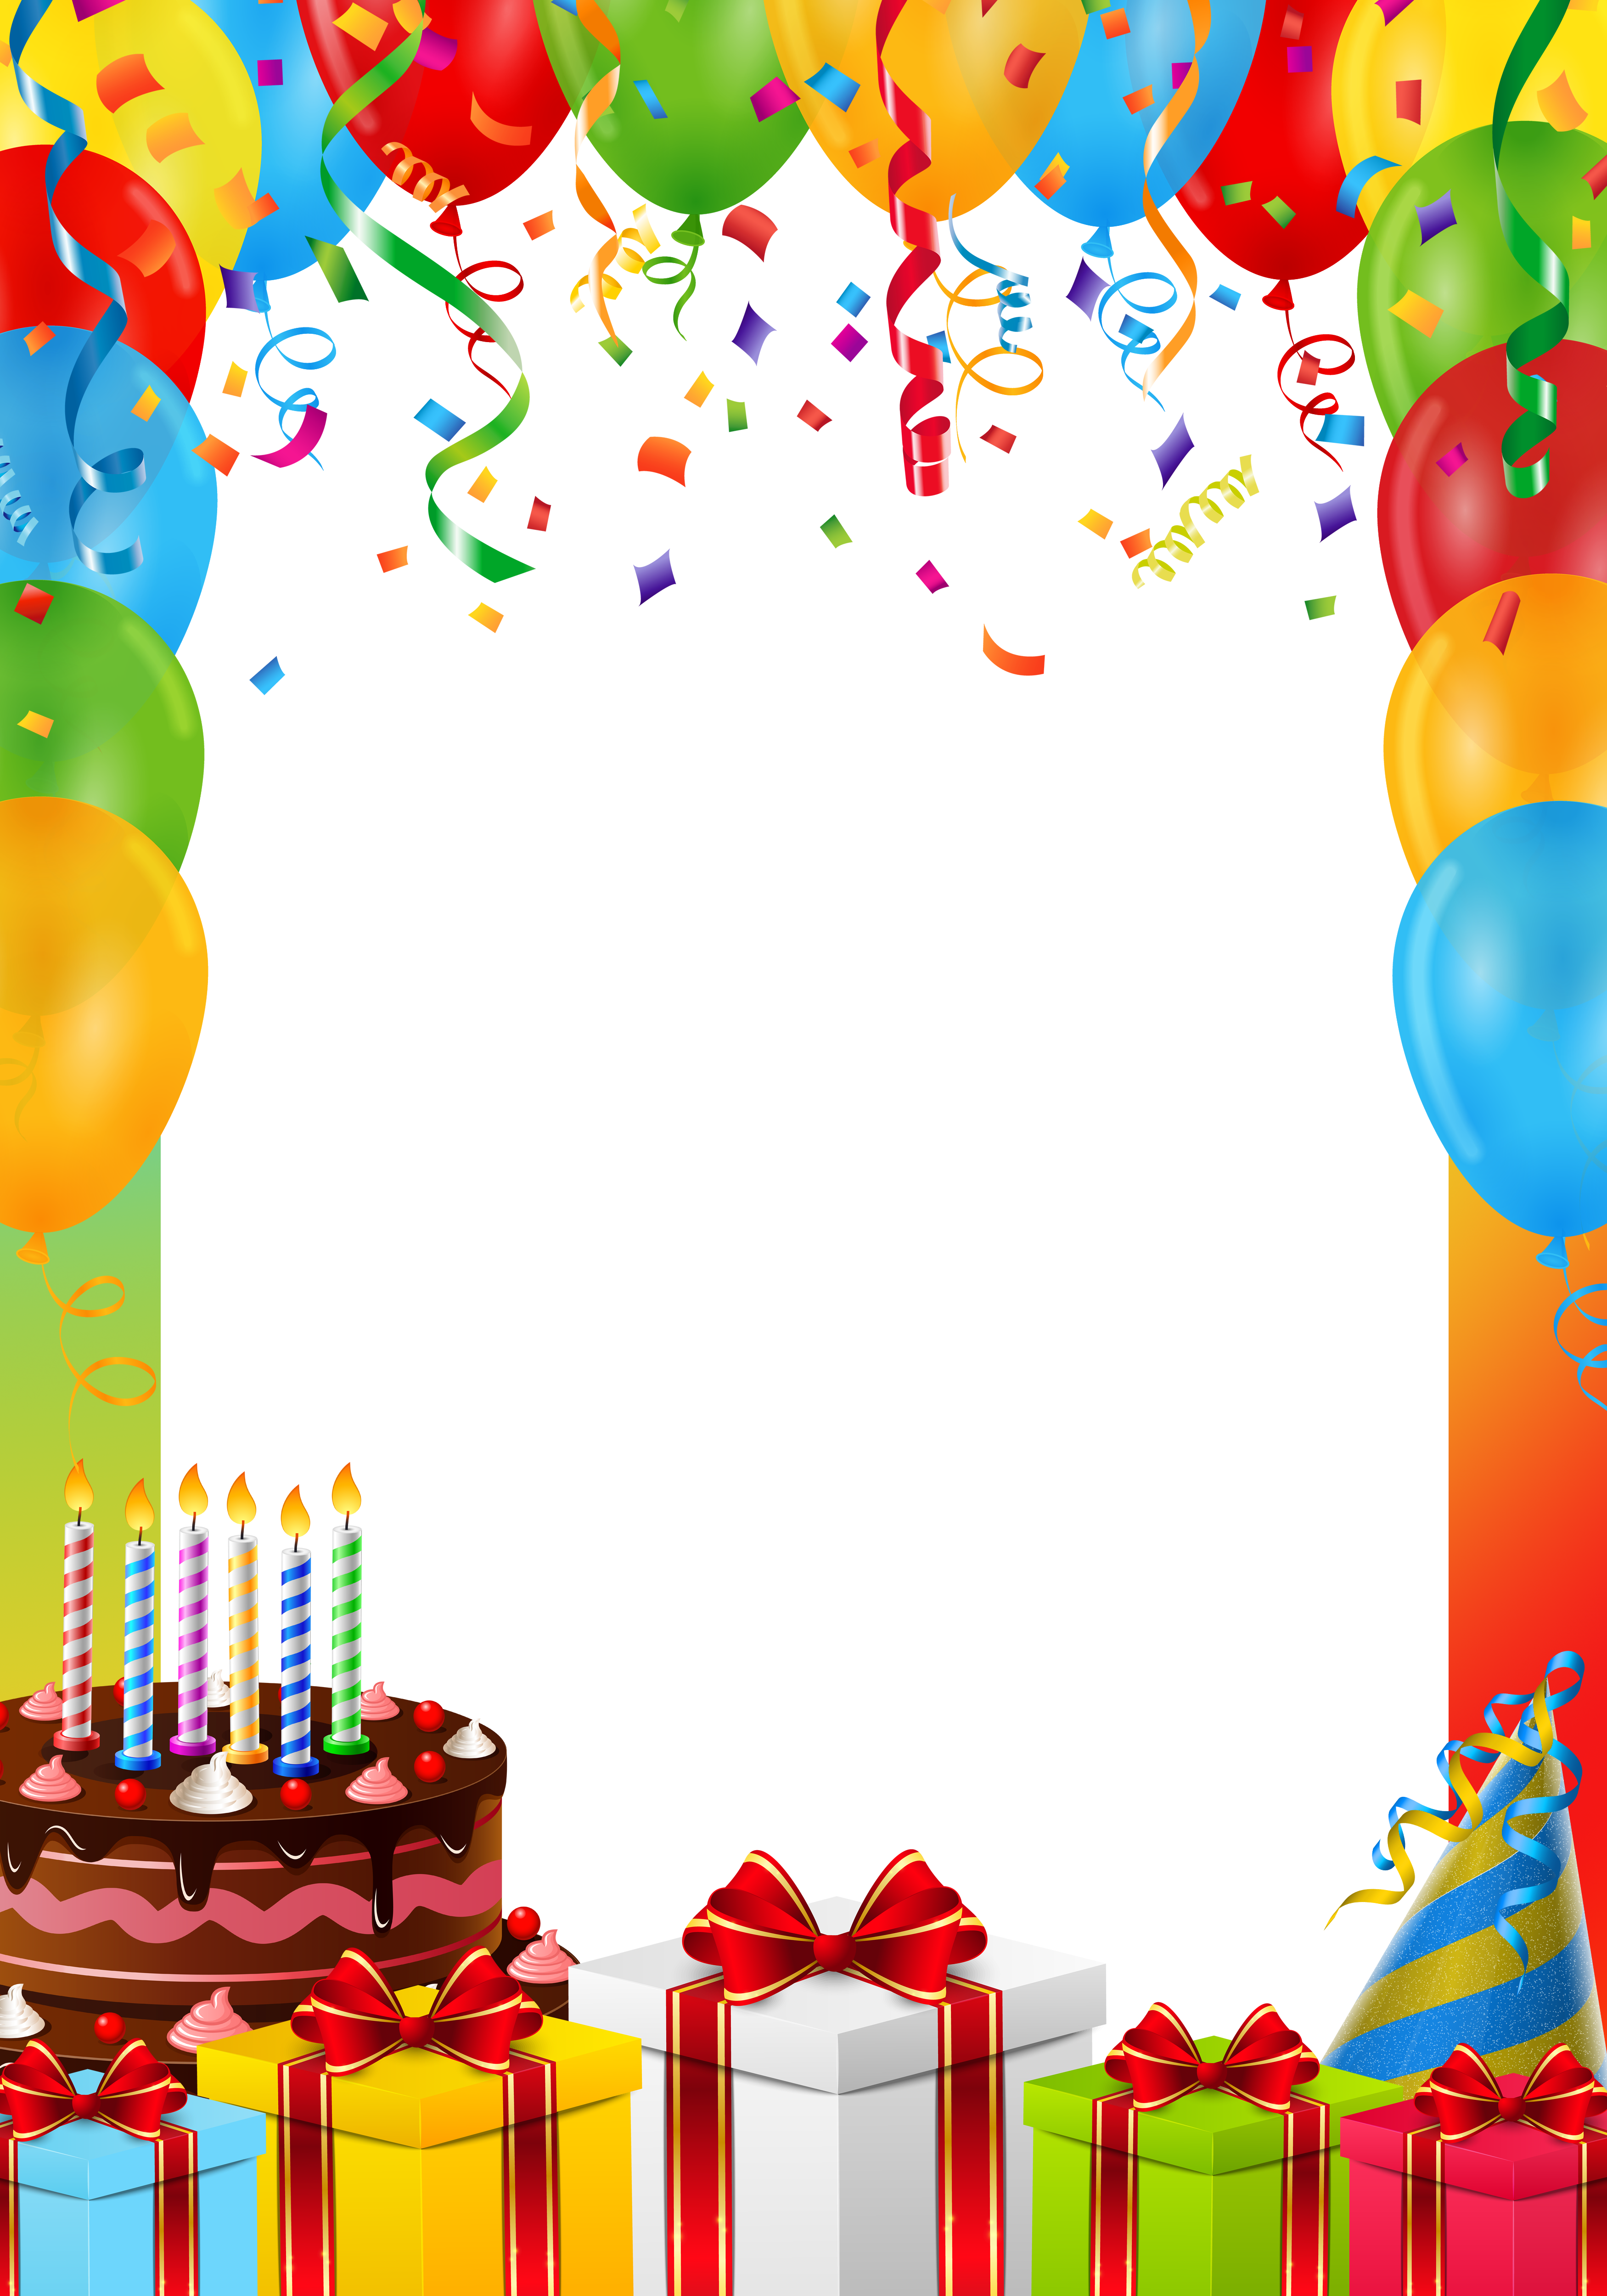 Birthday Frame PNG Transparent Image.